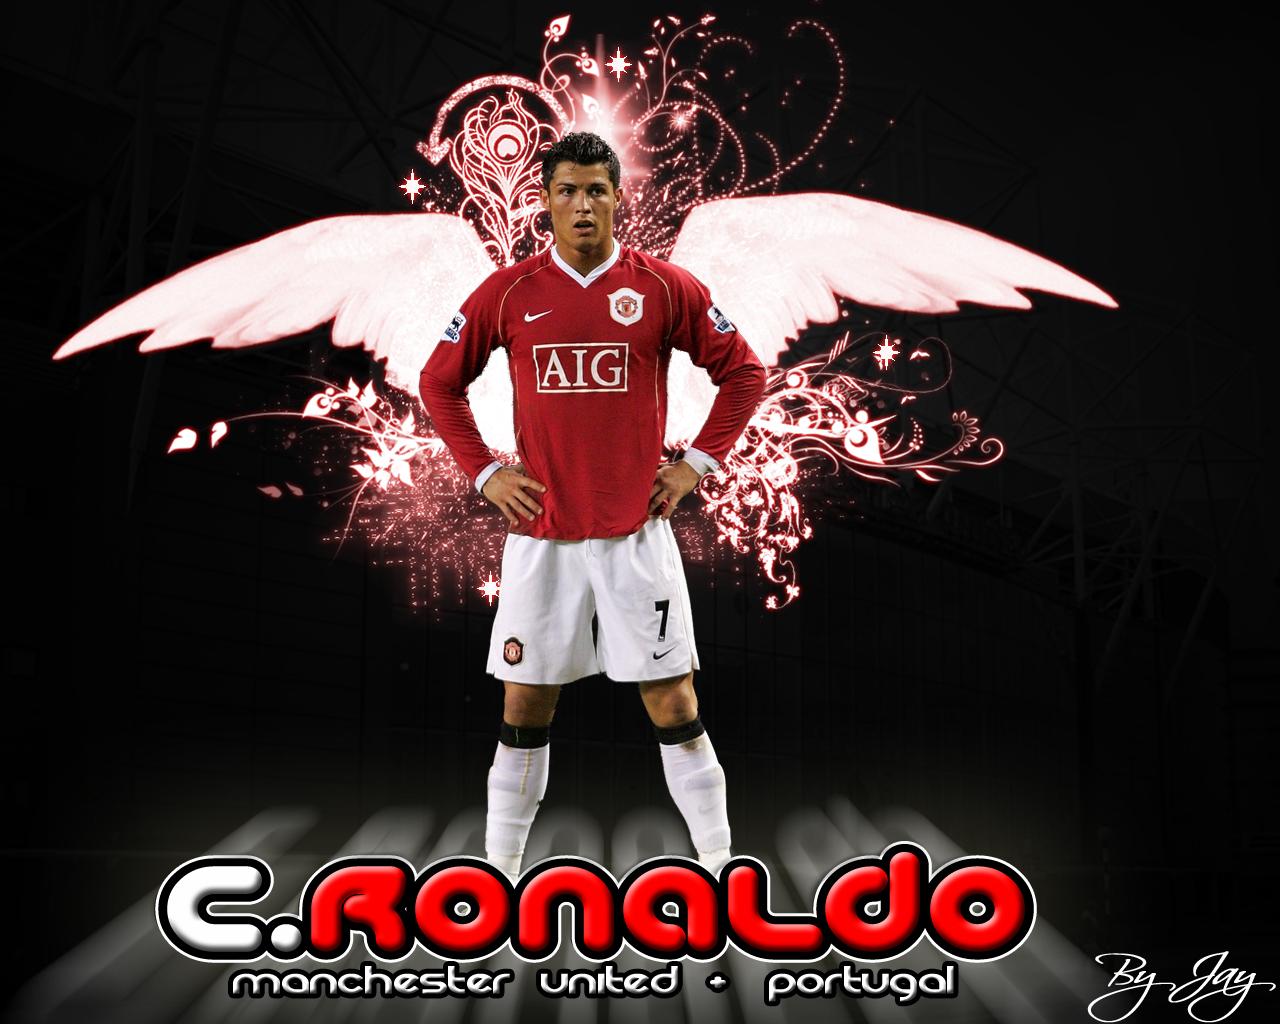 http://1.bp.blogspot.com/-tHEqitXm3cM/Ty68piO1TOI/AAAAAAAAA6E/nufiVw3xkeA/s1600/Christiano+Ronaldo+2012Wallpaper-6.jpg